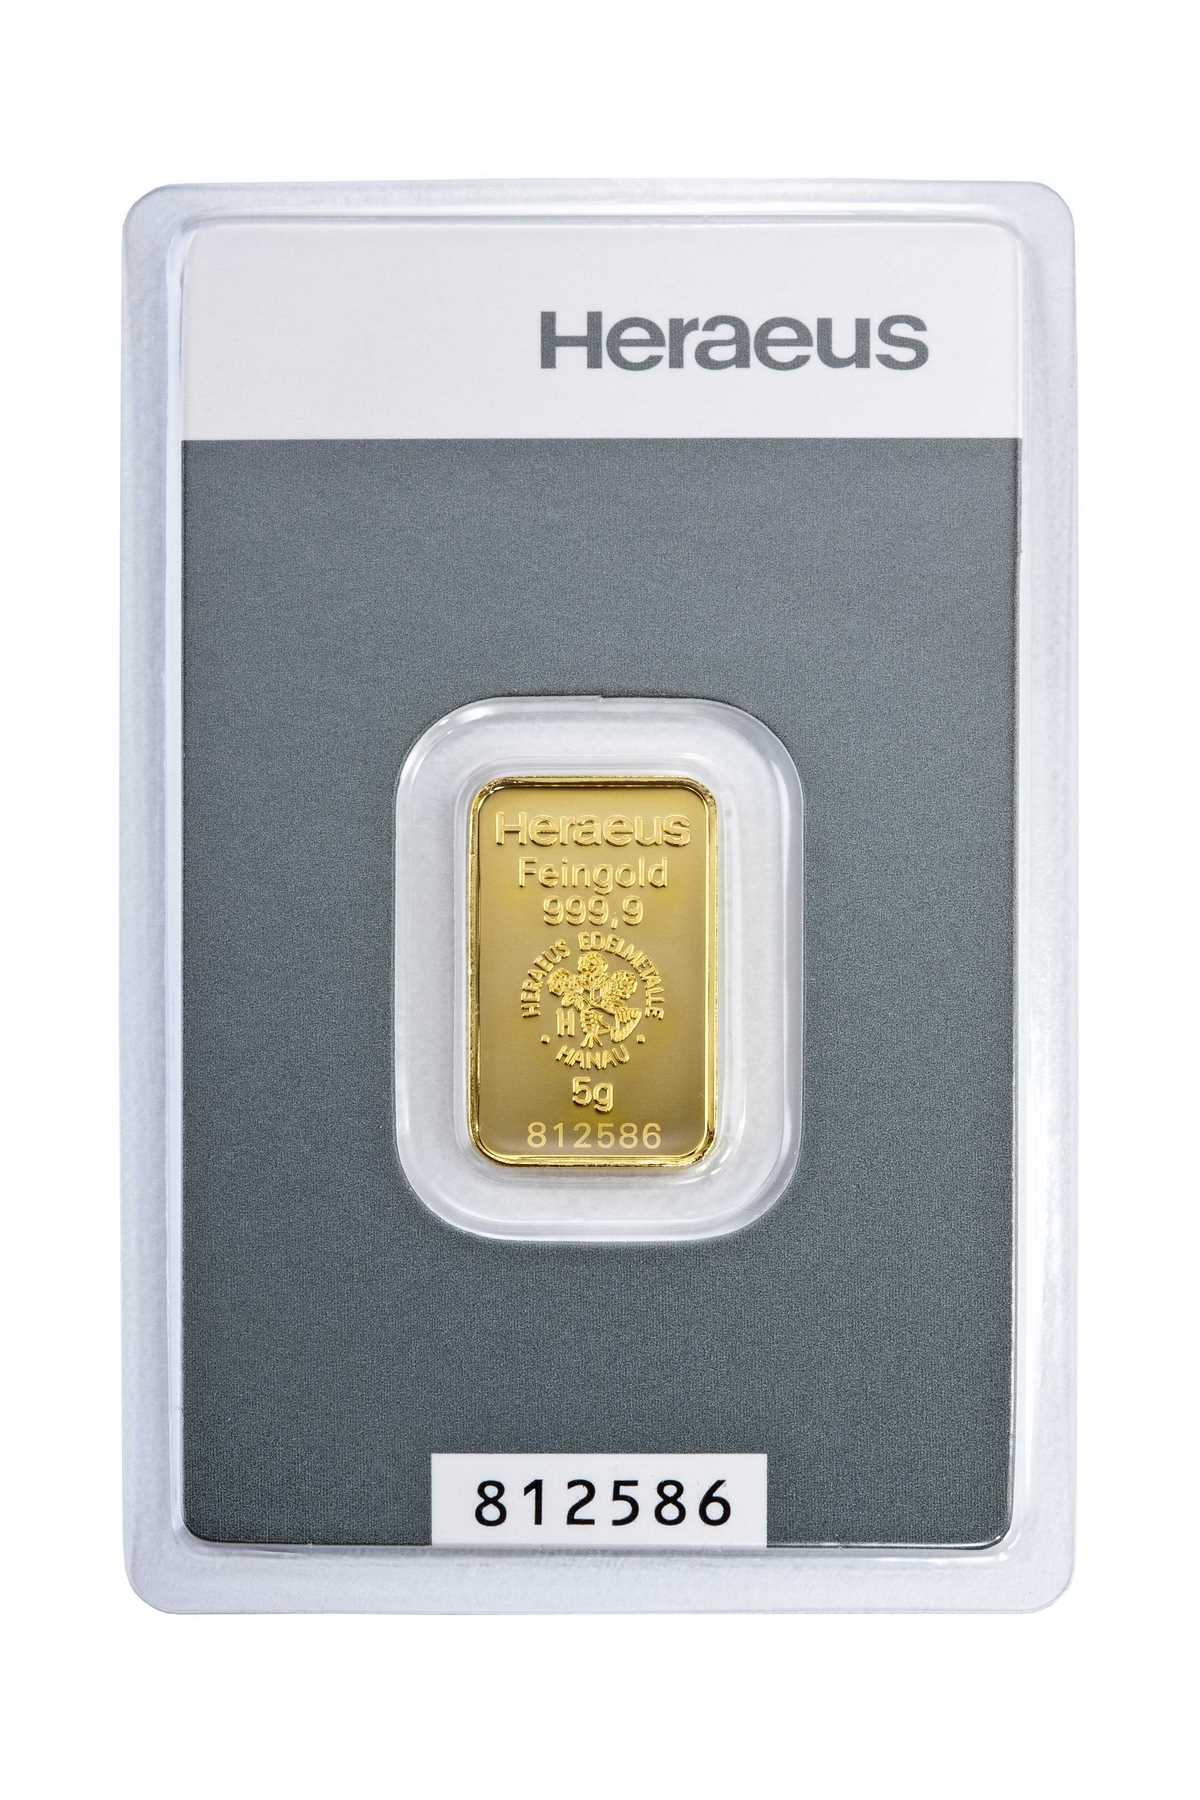 5 g Kinebar Heraeus  Goldbarren